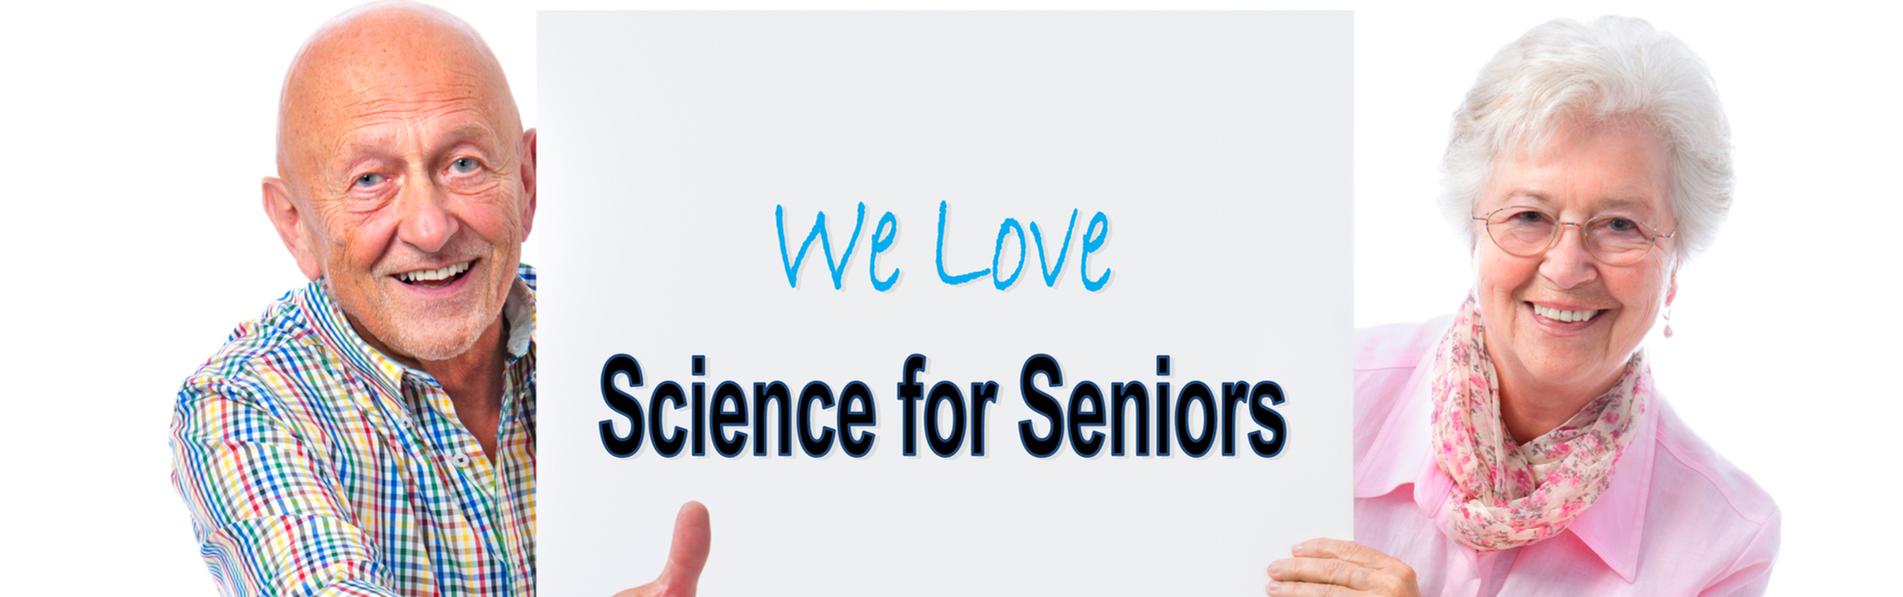 science for seniors - senior science pro